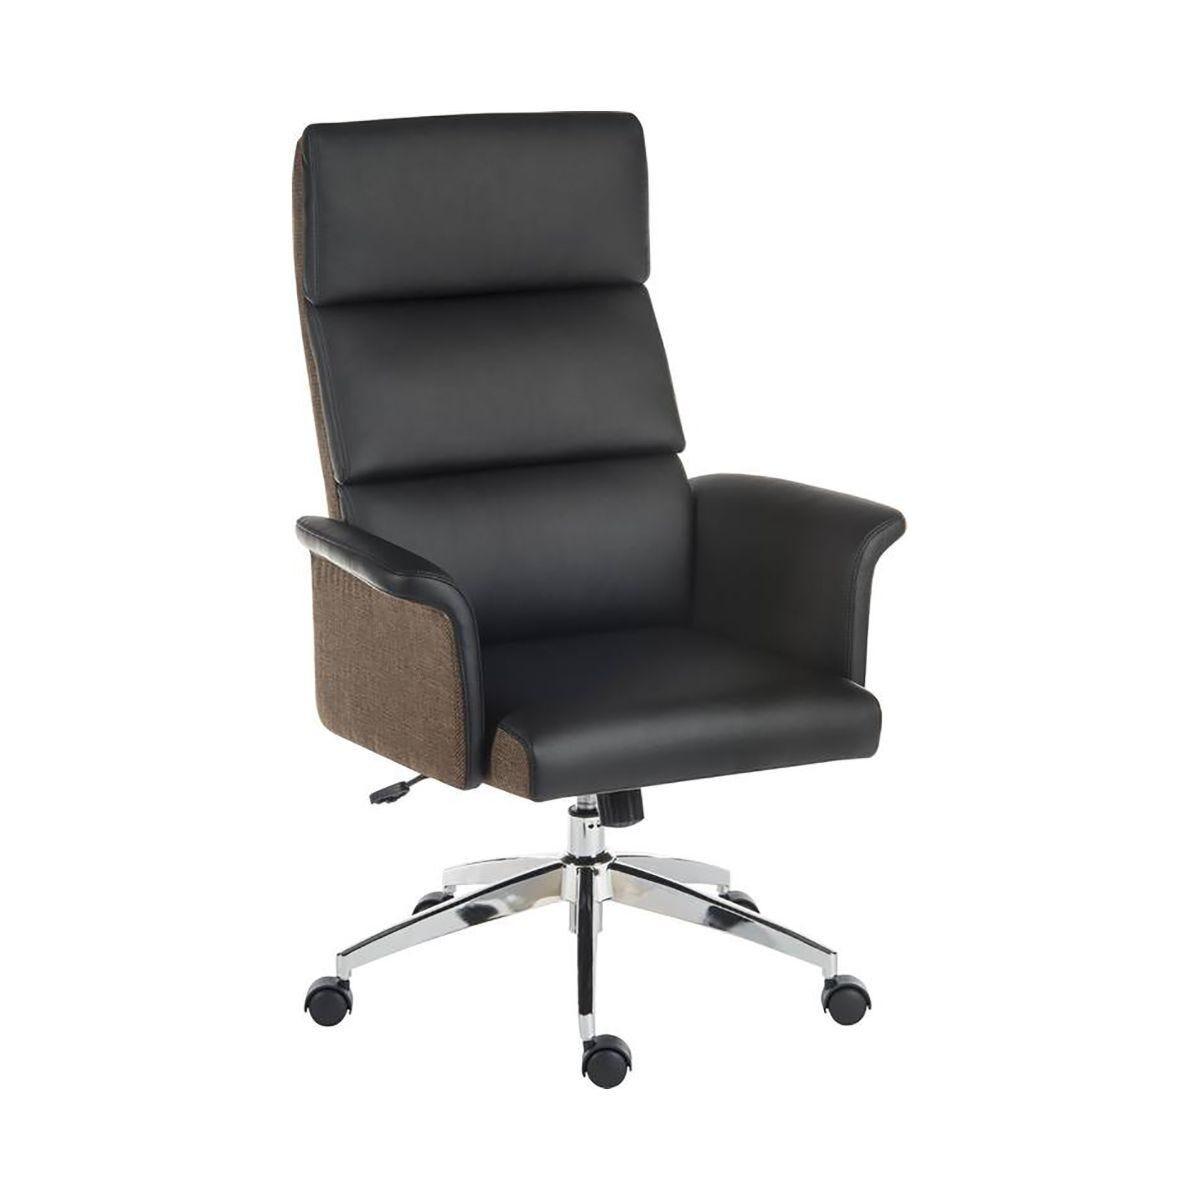 Teknik Office Elegance High Back Faux Leather Executive Chair Black